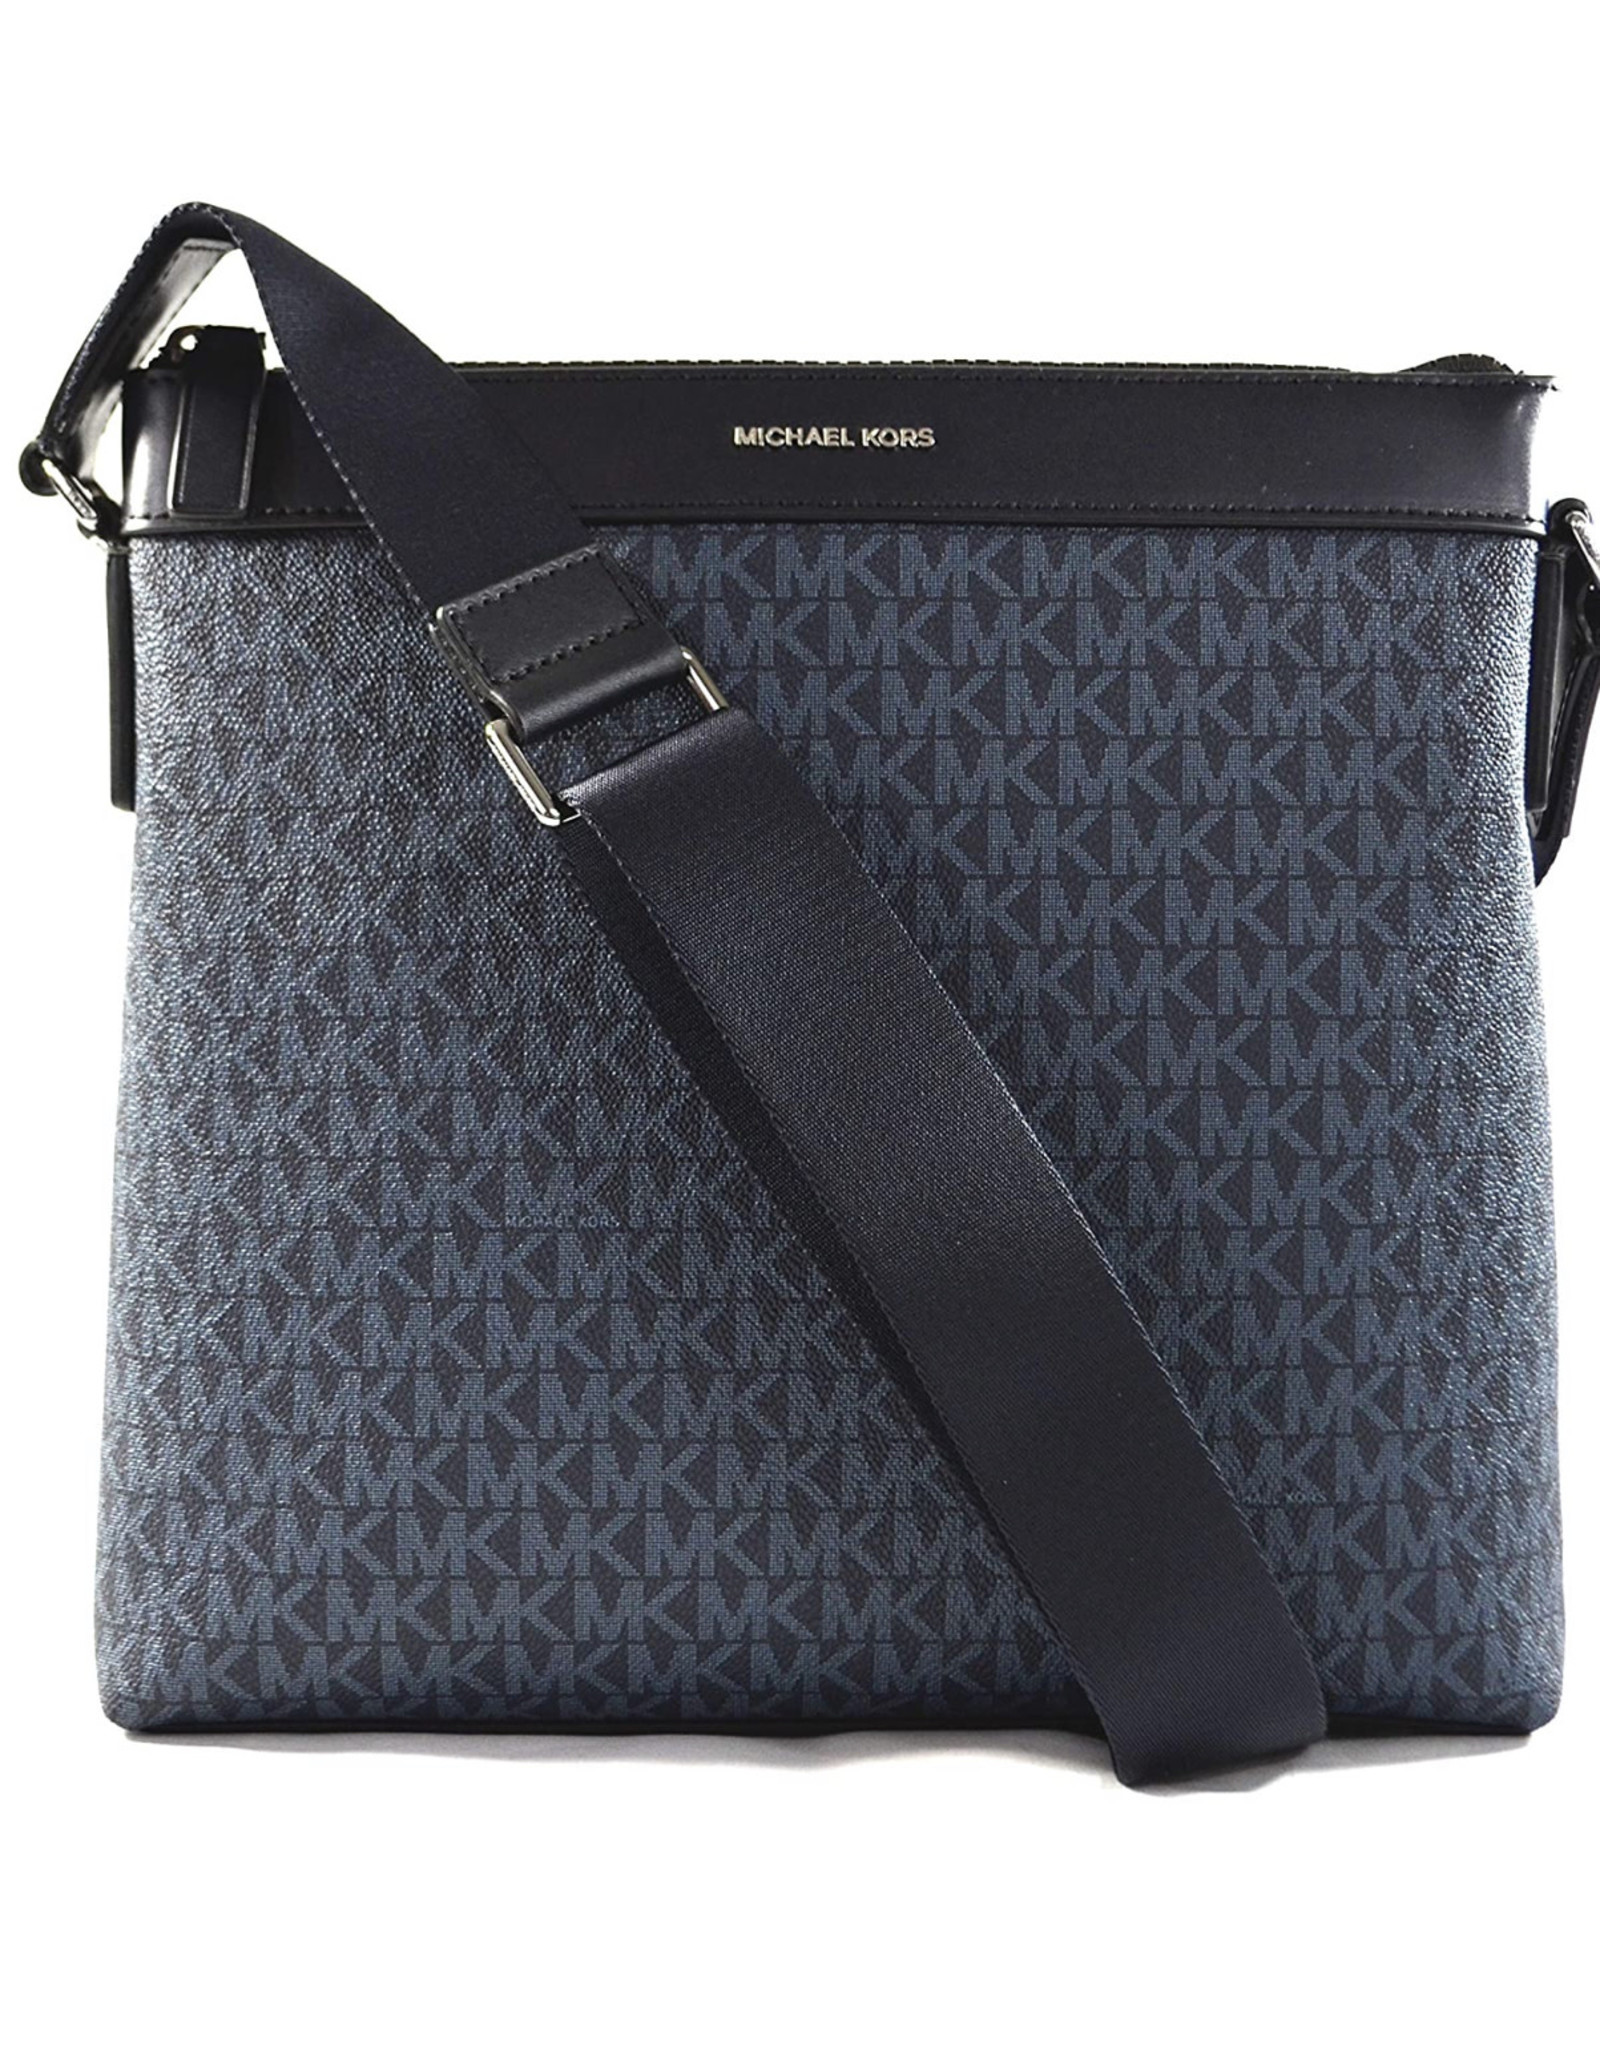 Michael Kors Michael Kors Crossbody Bag Cooper